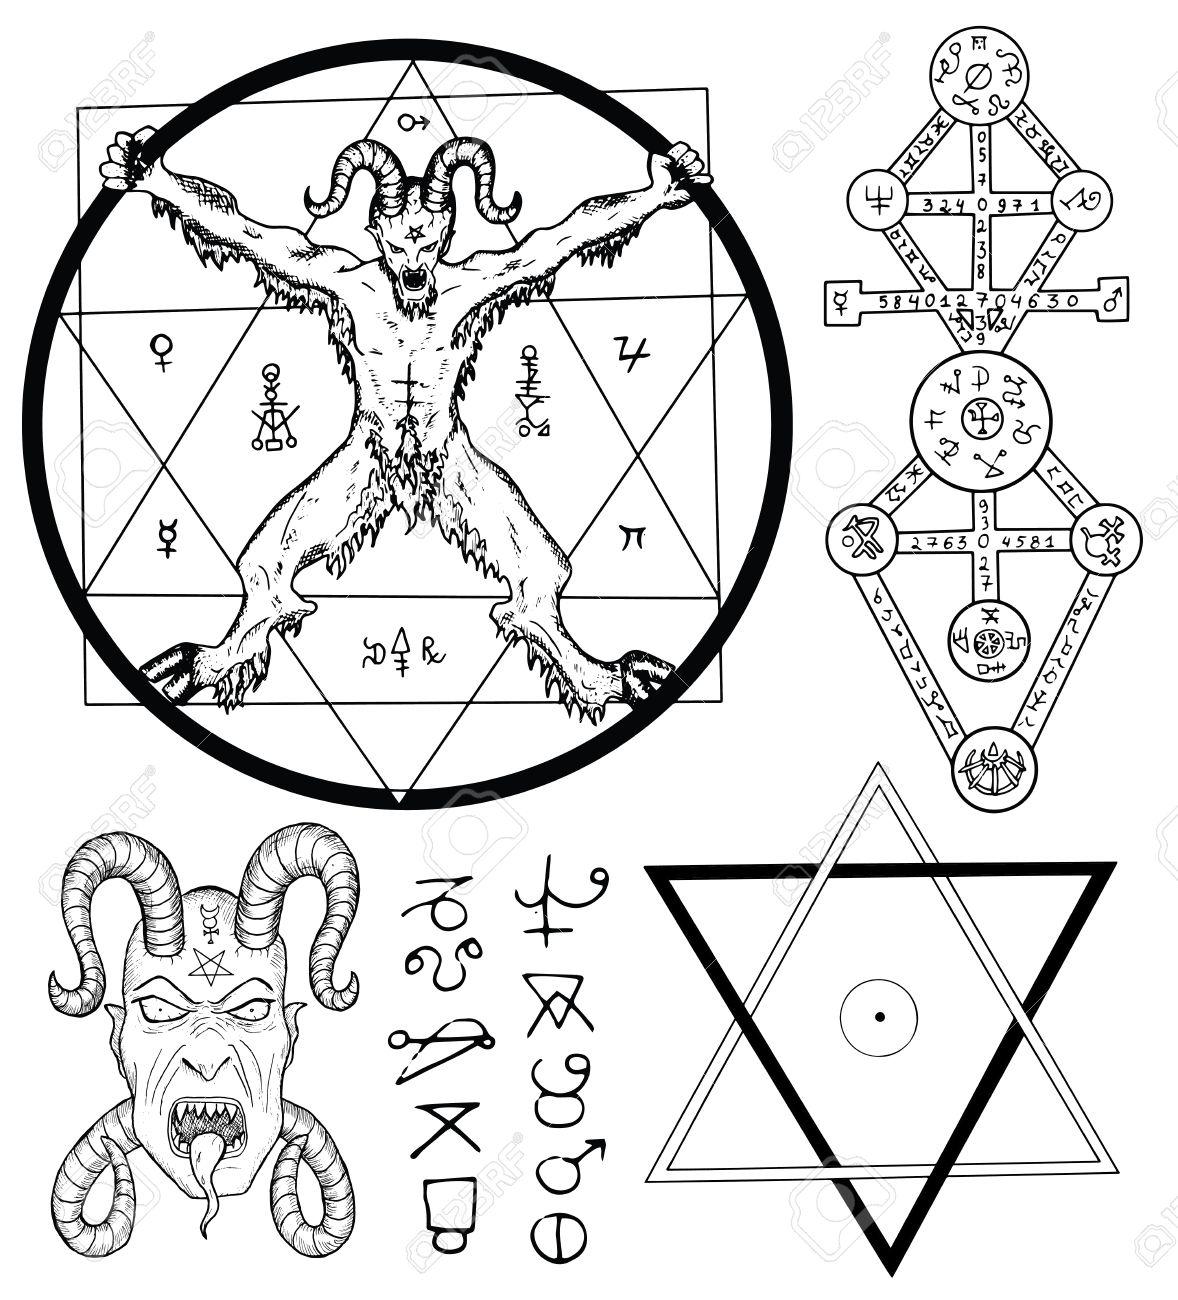 Satanic Drawing At Getdrawings Free For Personal Use Satanic